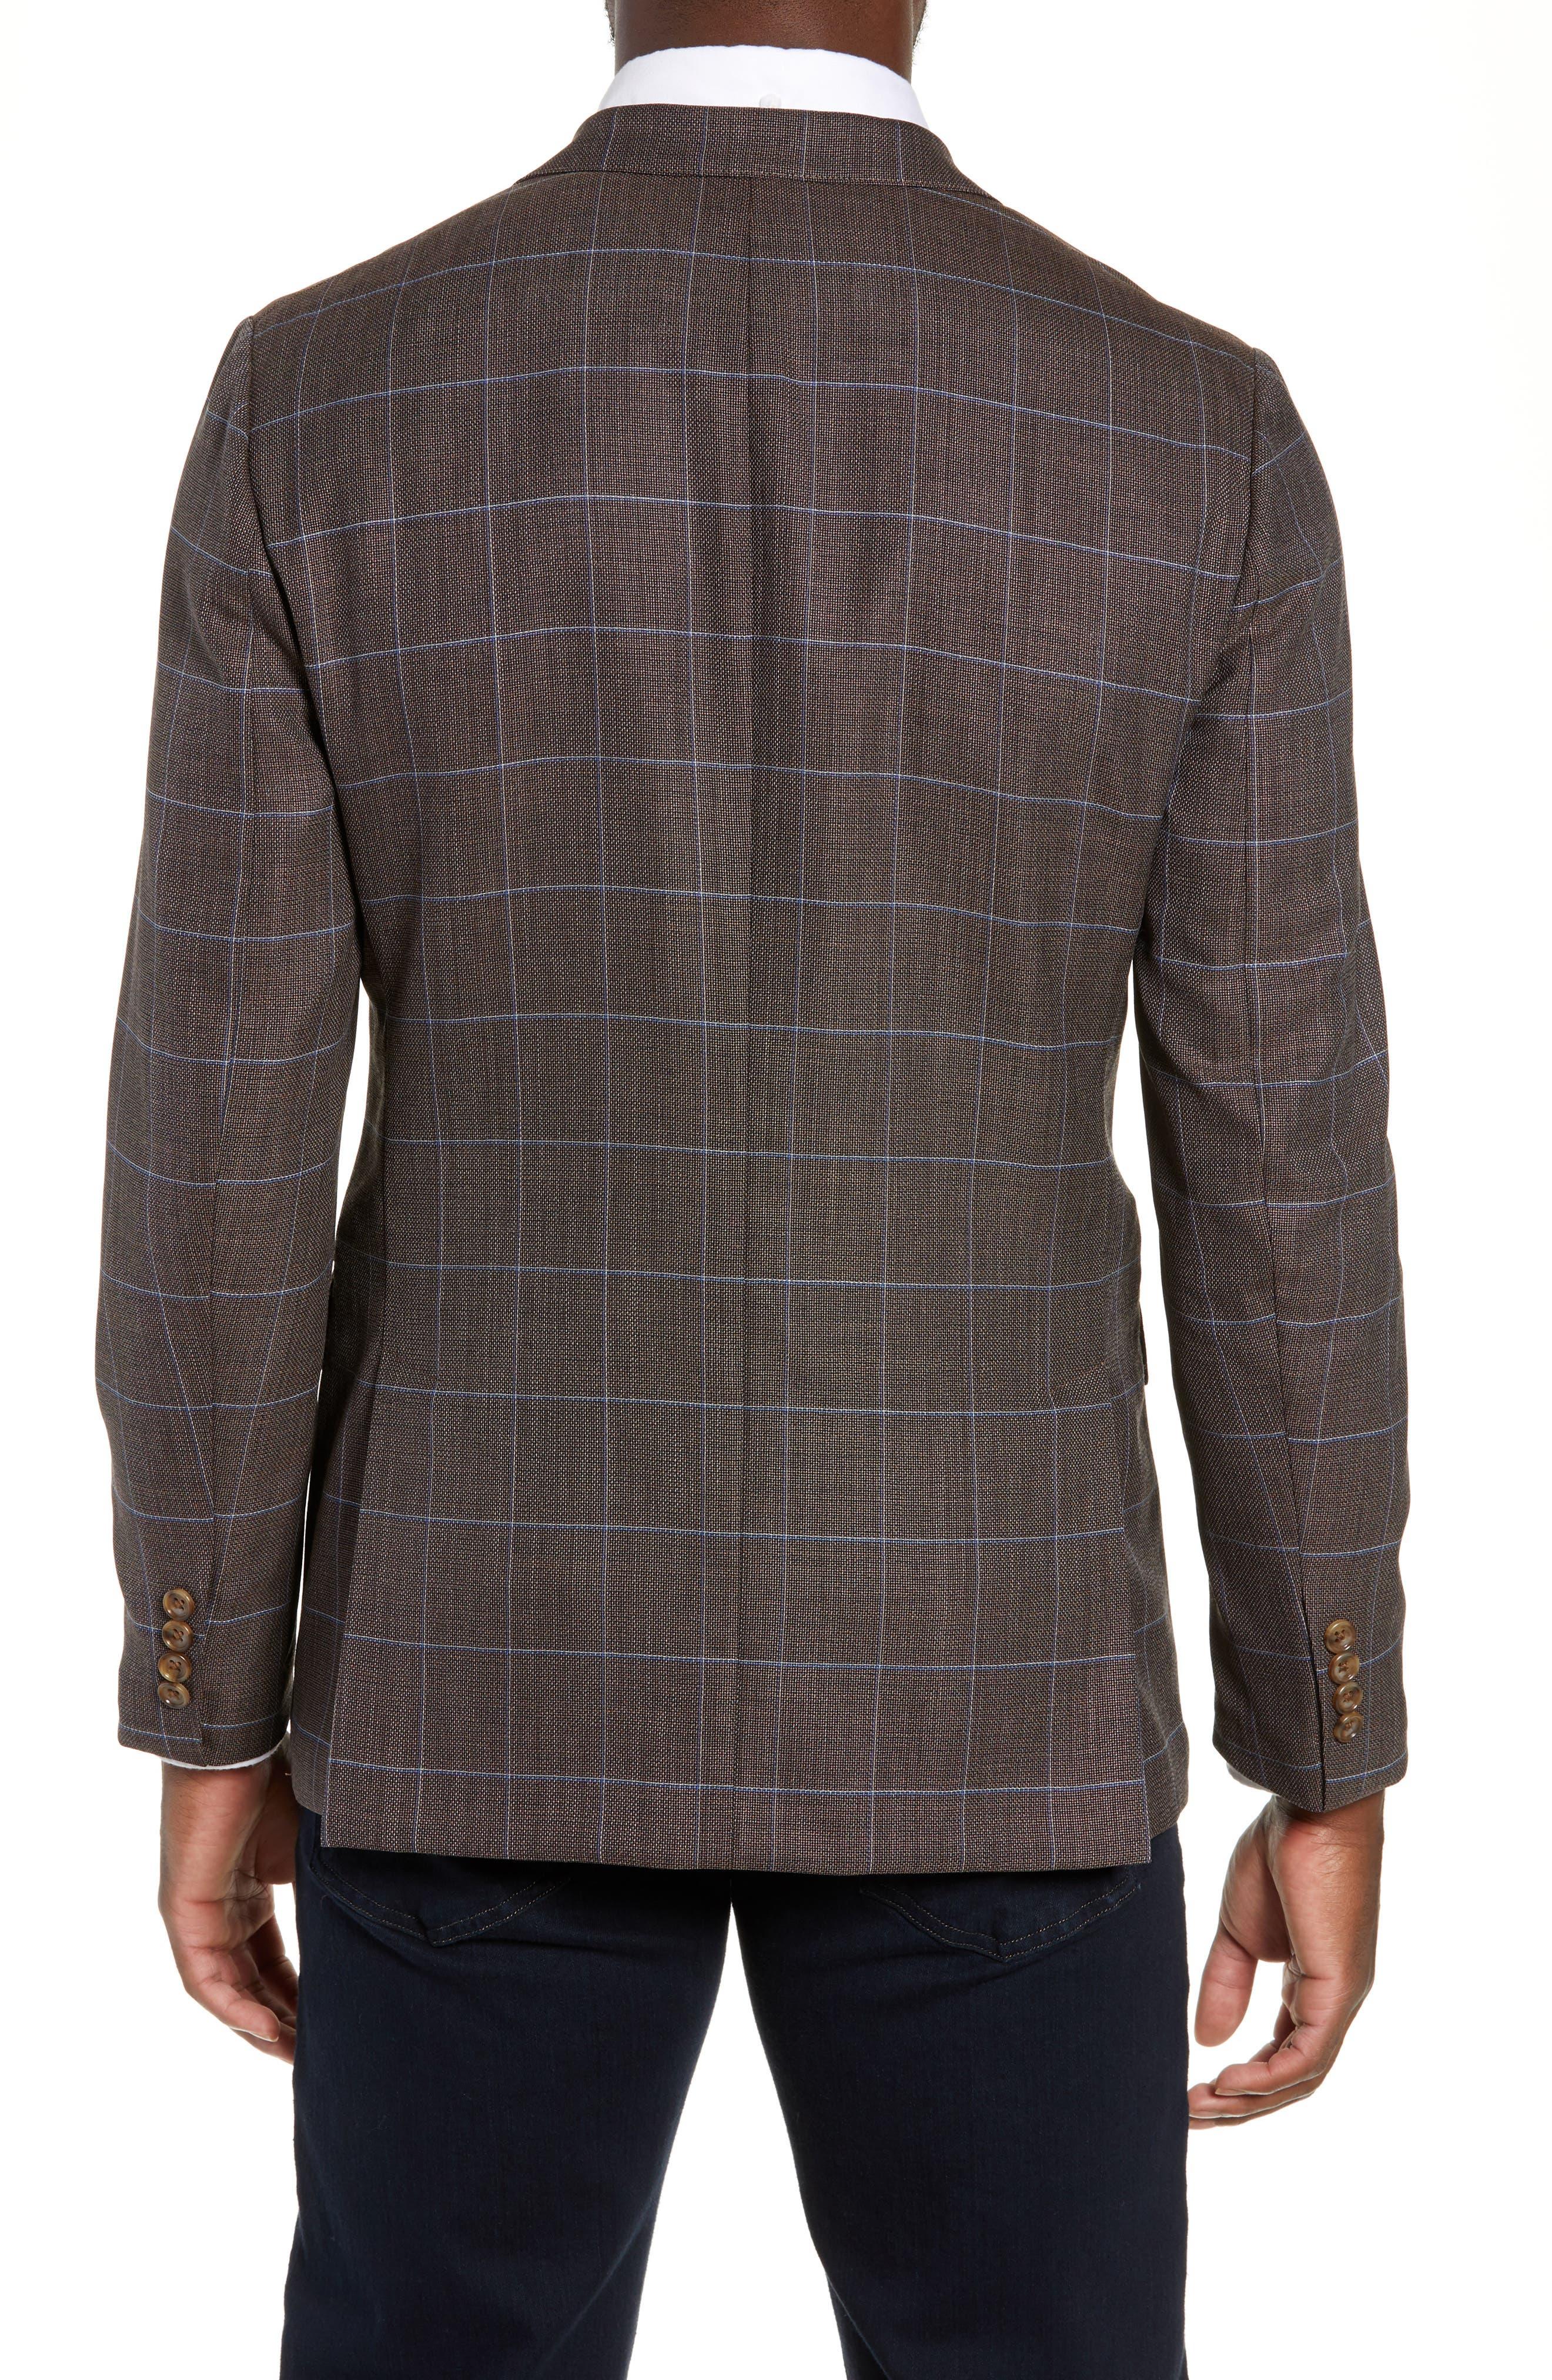 BONOBOS,                             Slim Fit Unconstructed Wool Sport Coat,                             Alternate thumbnail 2, color,                             250